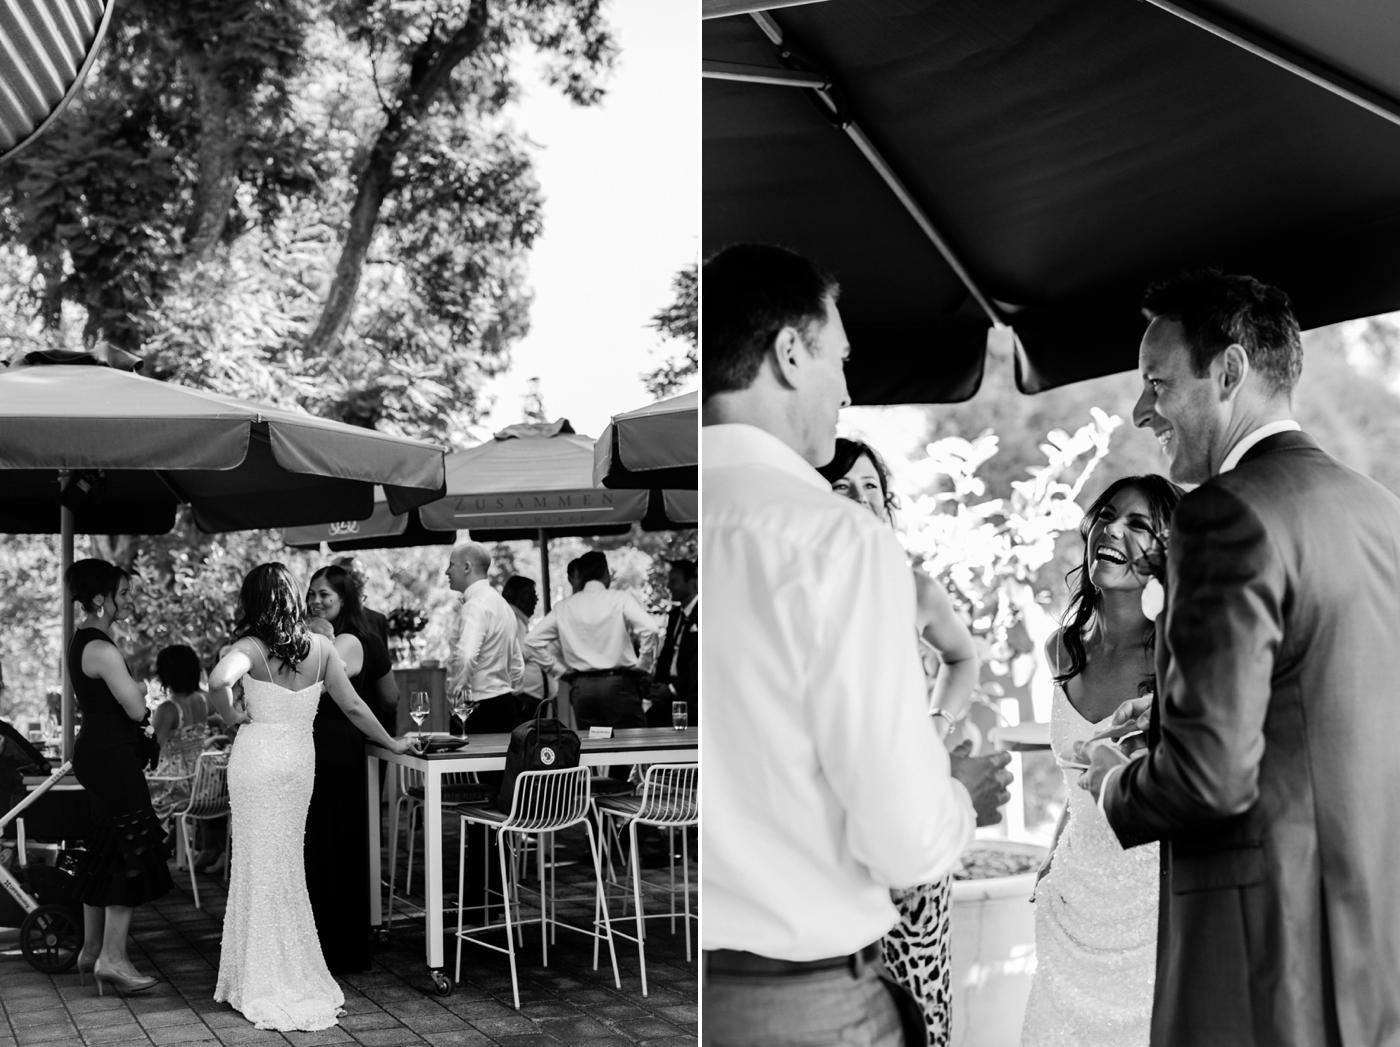 Kellie & Brent - Adelaide City Wedding - Natural wedding photography in Adelaide - Katherine Schultz - www.katherineschultzphotography.com 24